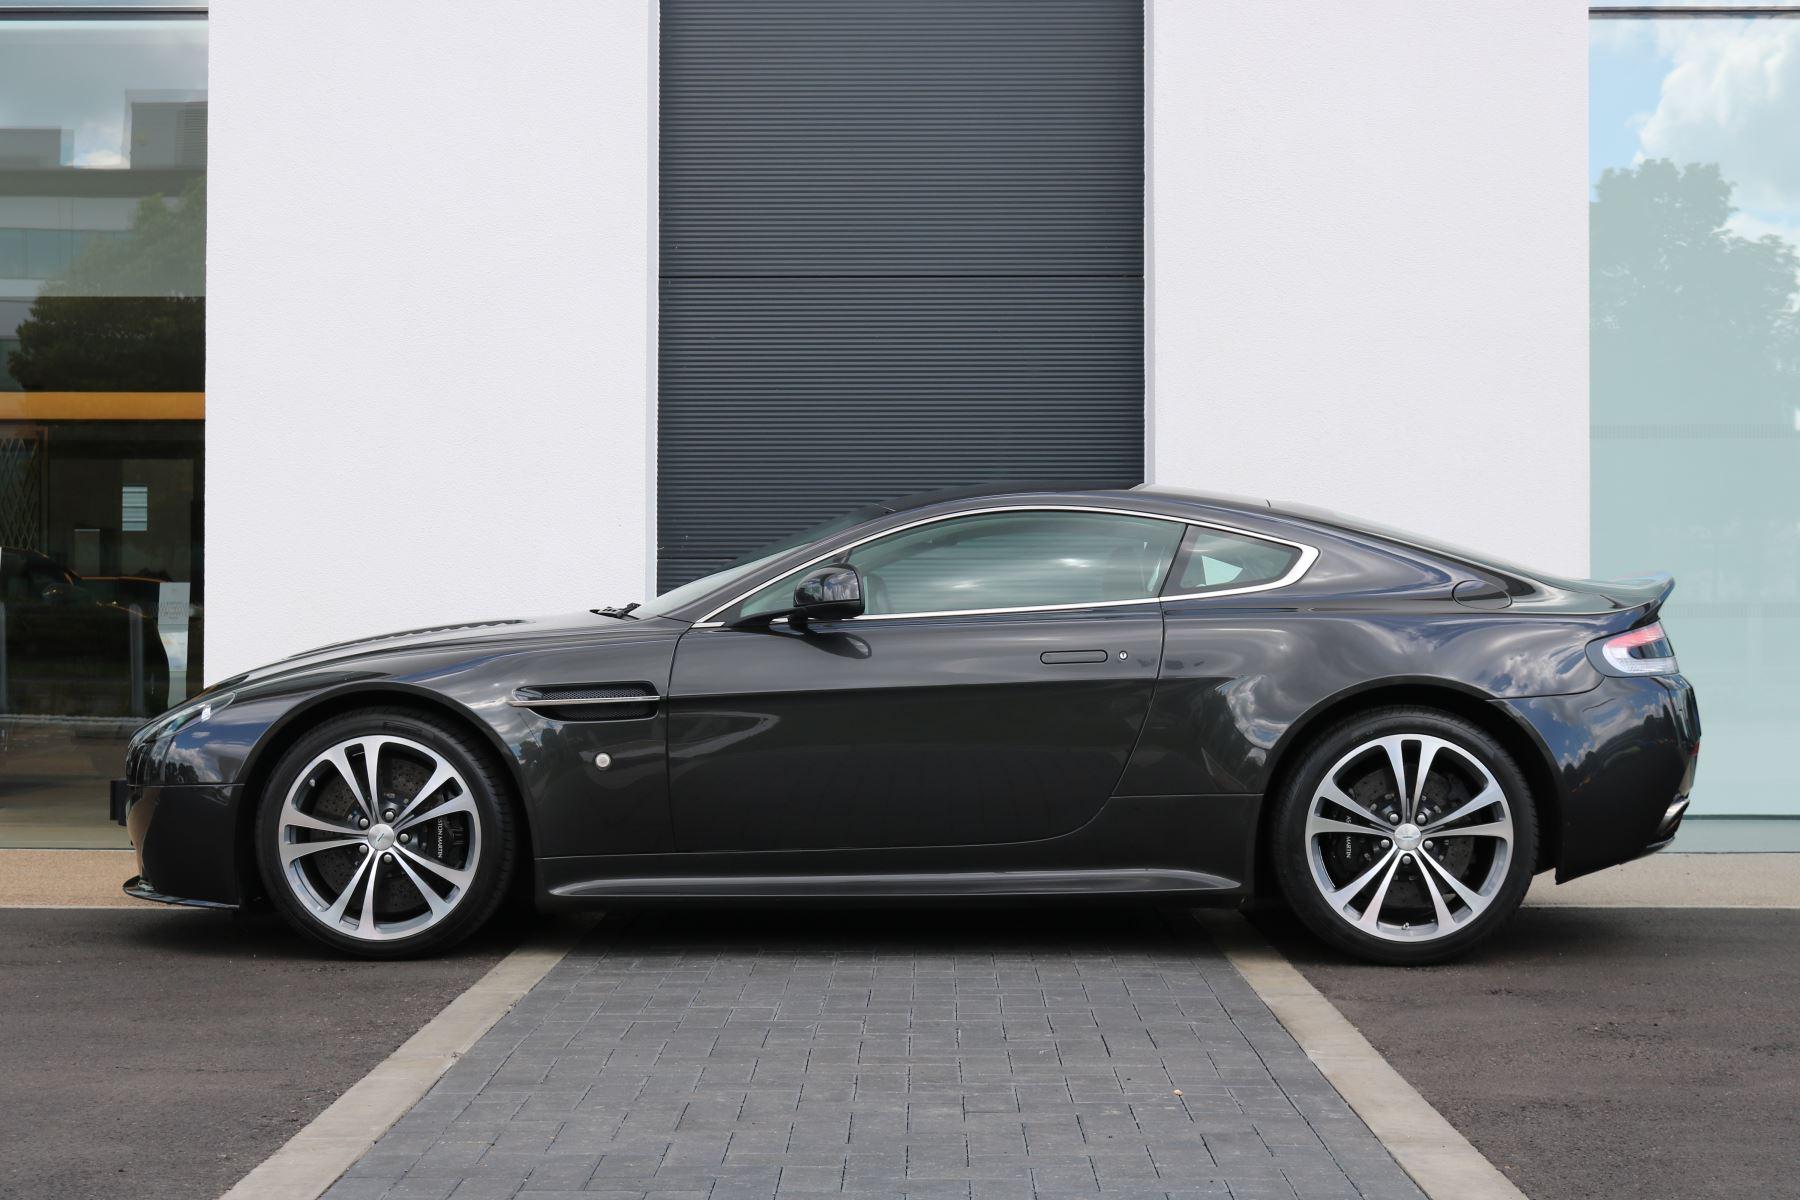 Aston Martin V12 Vantage 2dr image 3